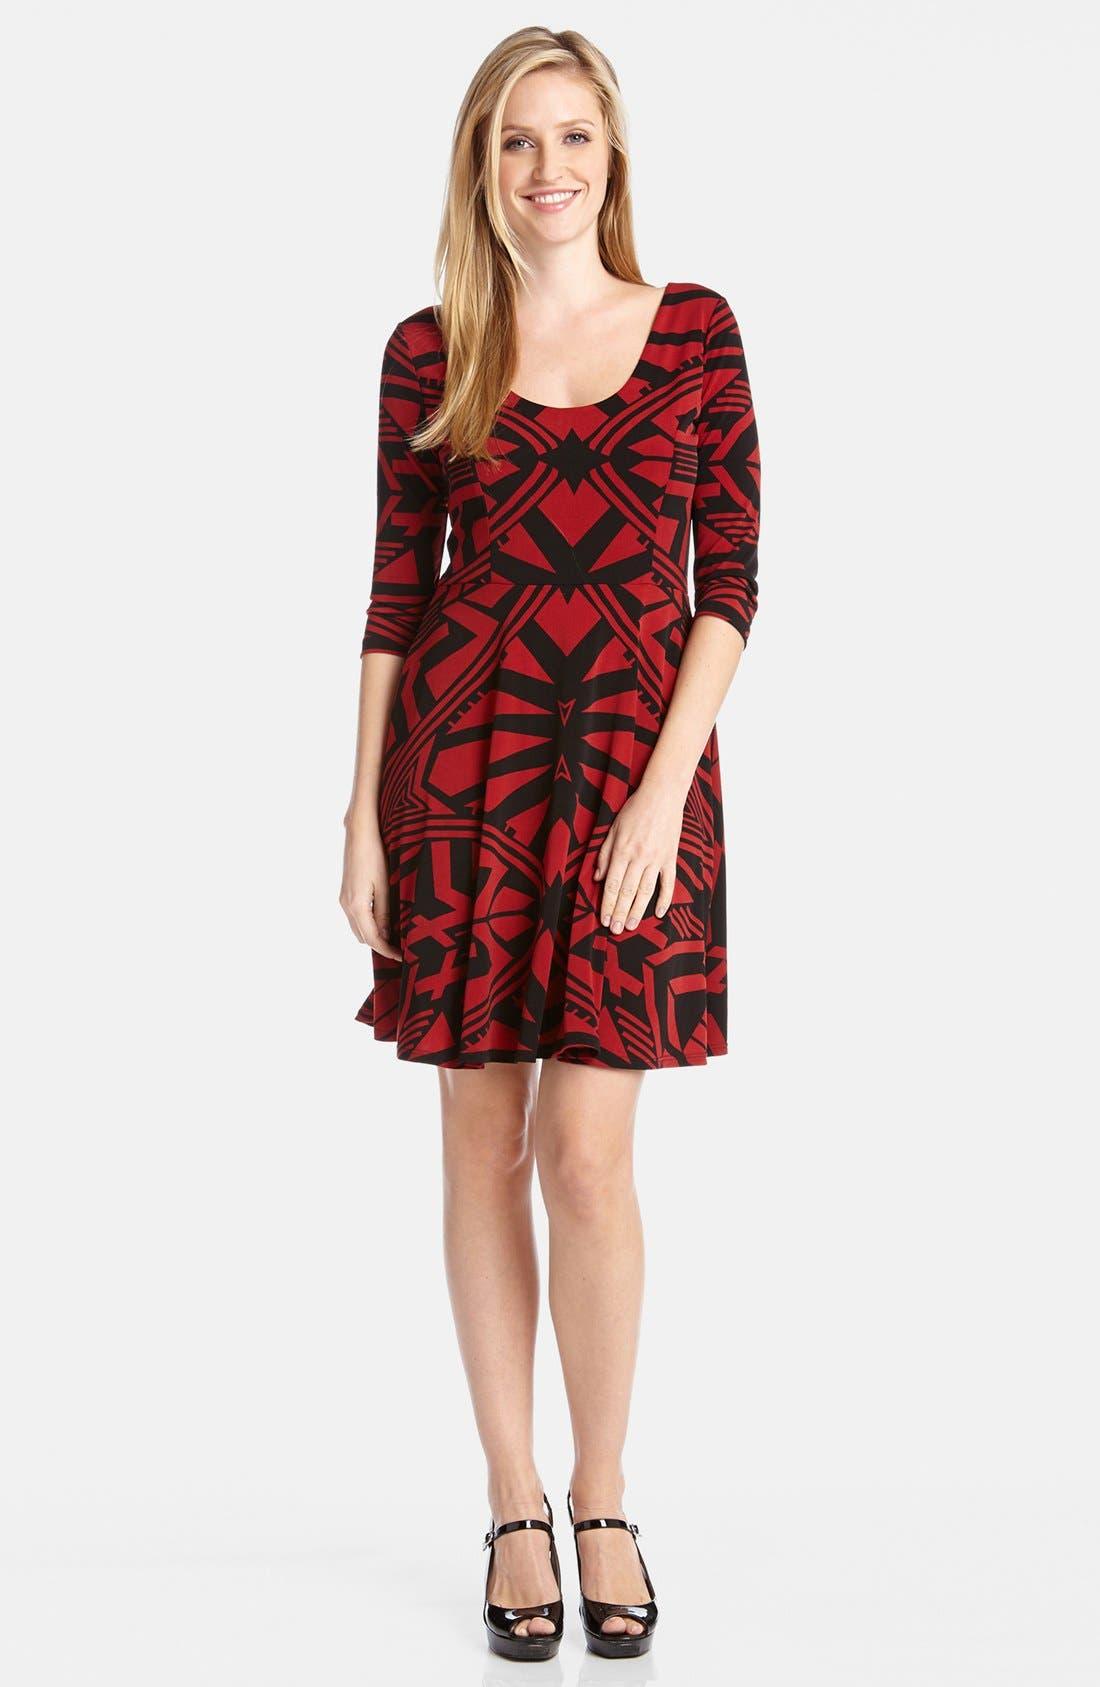 Alternate Image 1 Selected - Karen Kane 'Infrared Graphic' Fit & Flare Dress